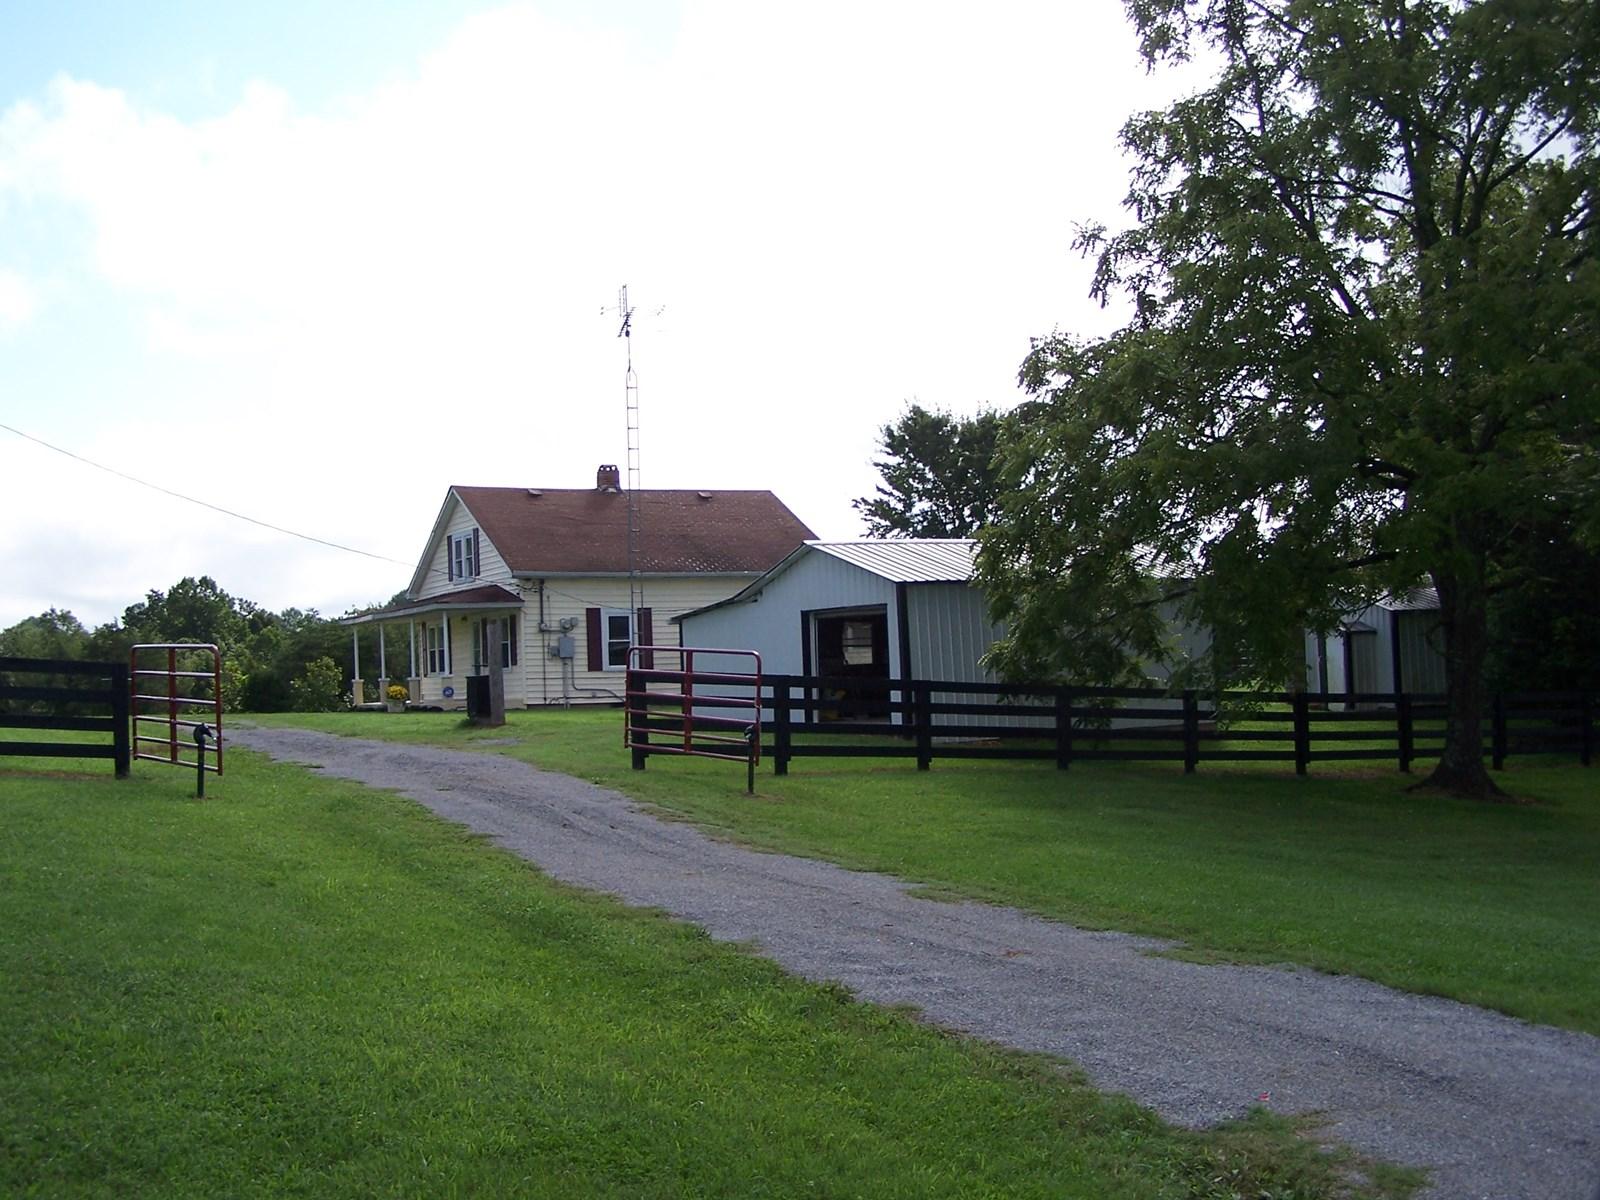 CATTLE/HORSE FARM - FRAME HOME/BARN - PASTURE - WINDSOR, KY